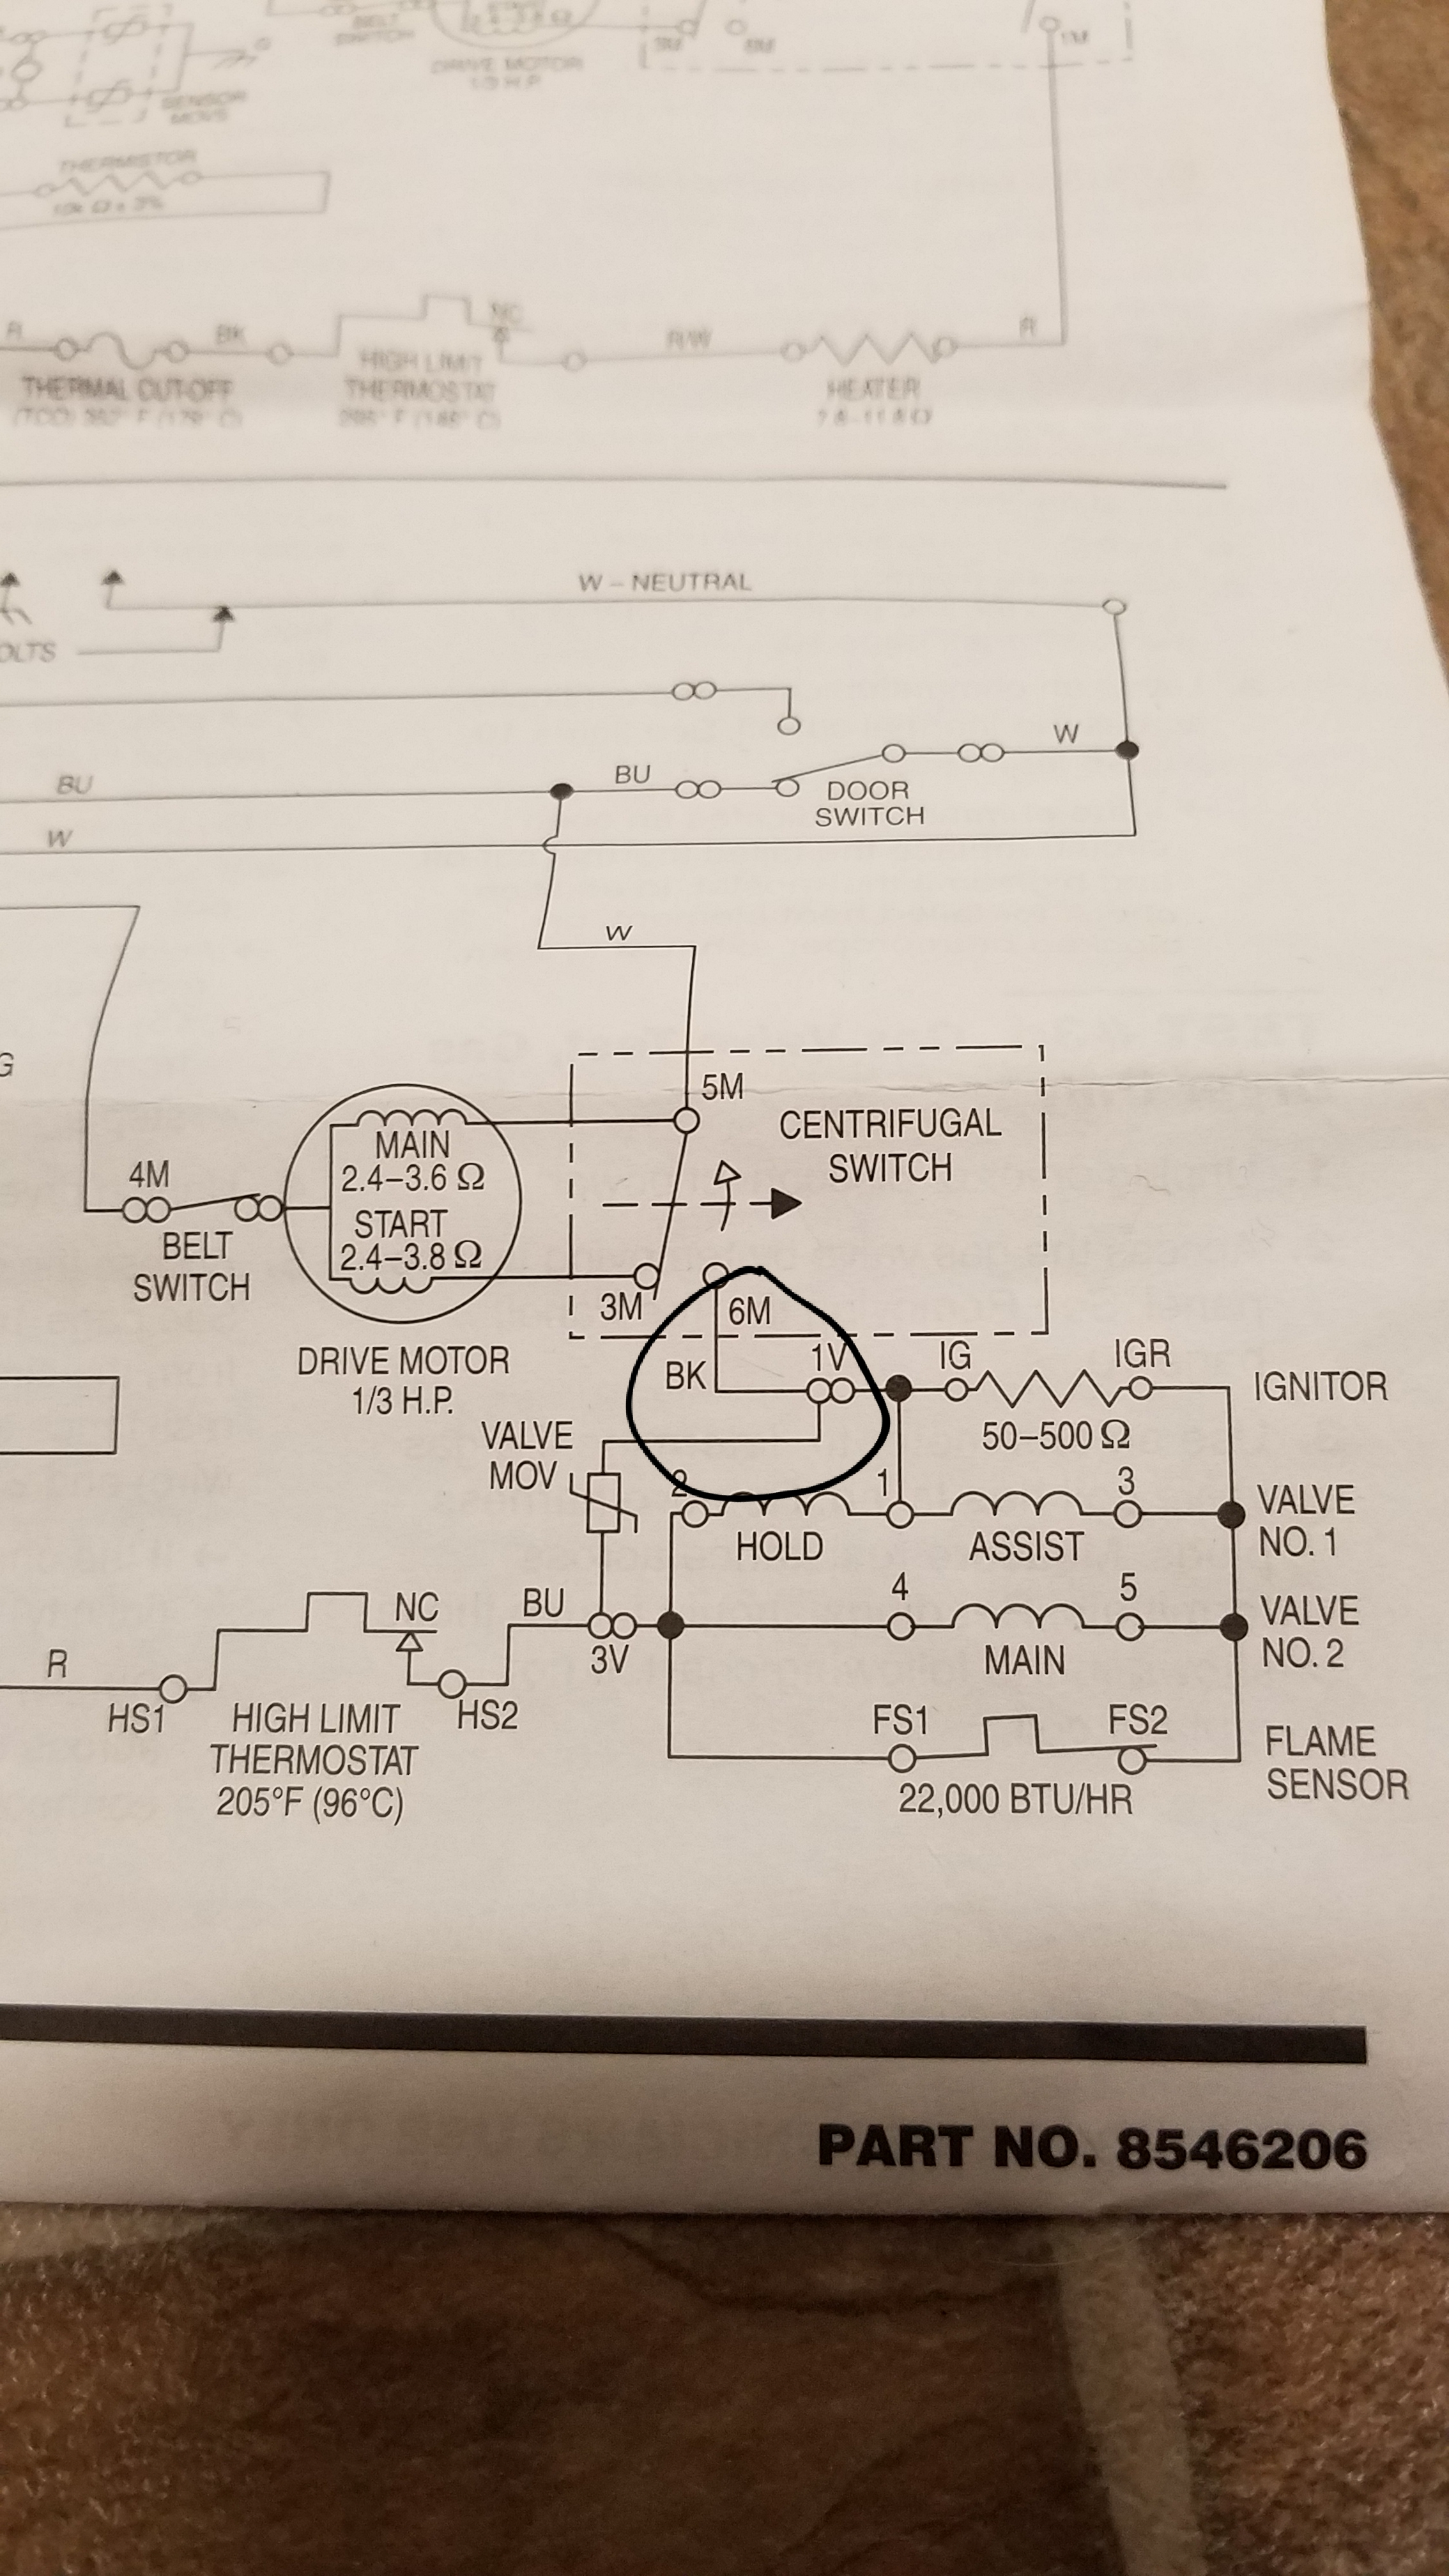 12 Volt Wiring Diagram View Diagram Wiring Diagrams Indicative Of